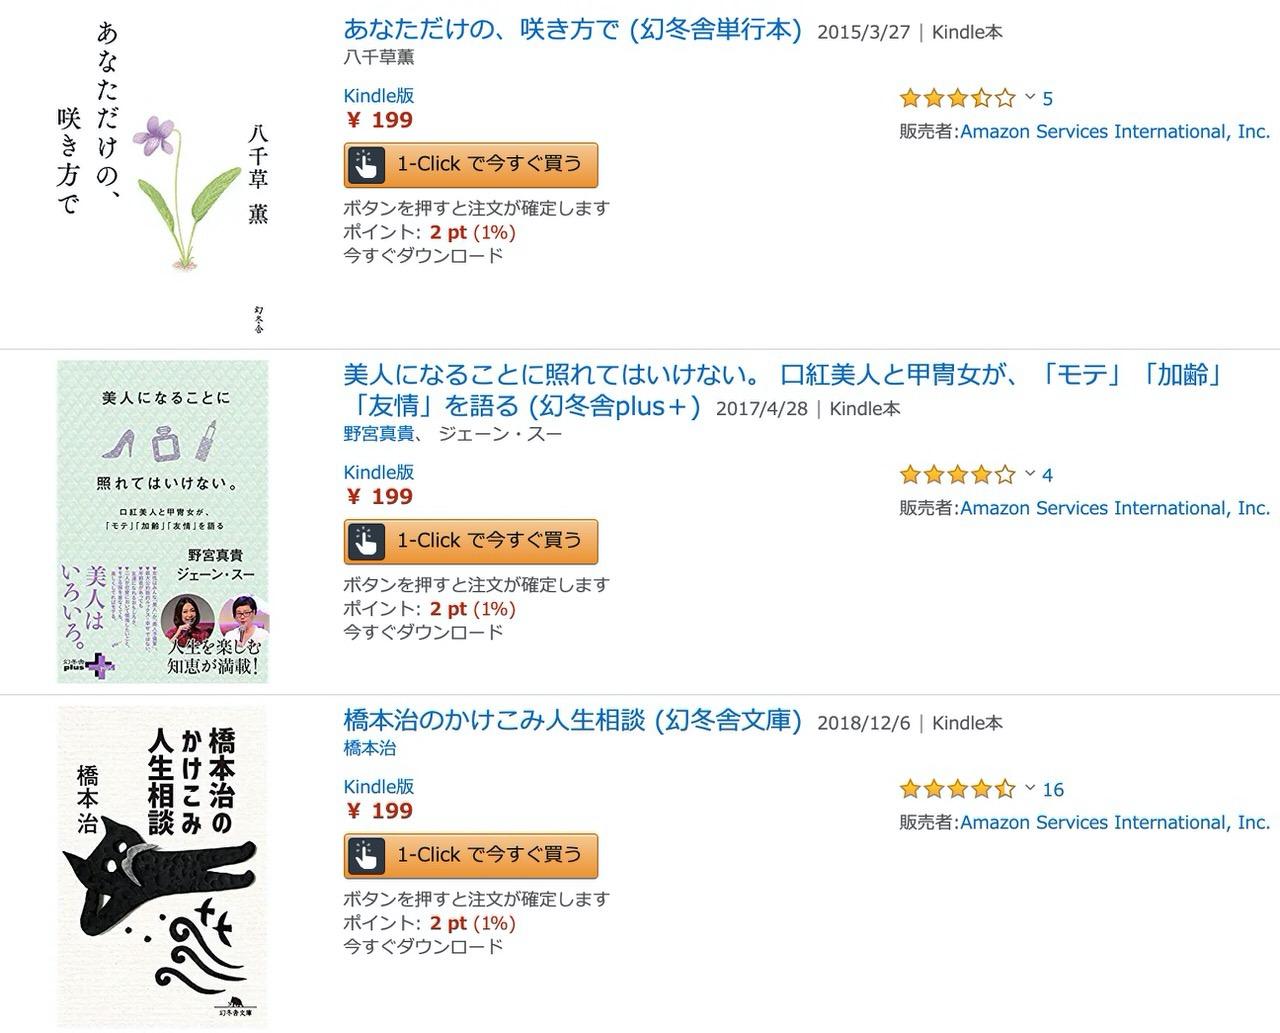 【Kindleセール】ジェーン・スー、橋本治、須藤元気など199円均一!「おすすめ実用書300冊以上」開催中(1/30まで)